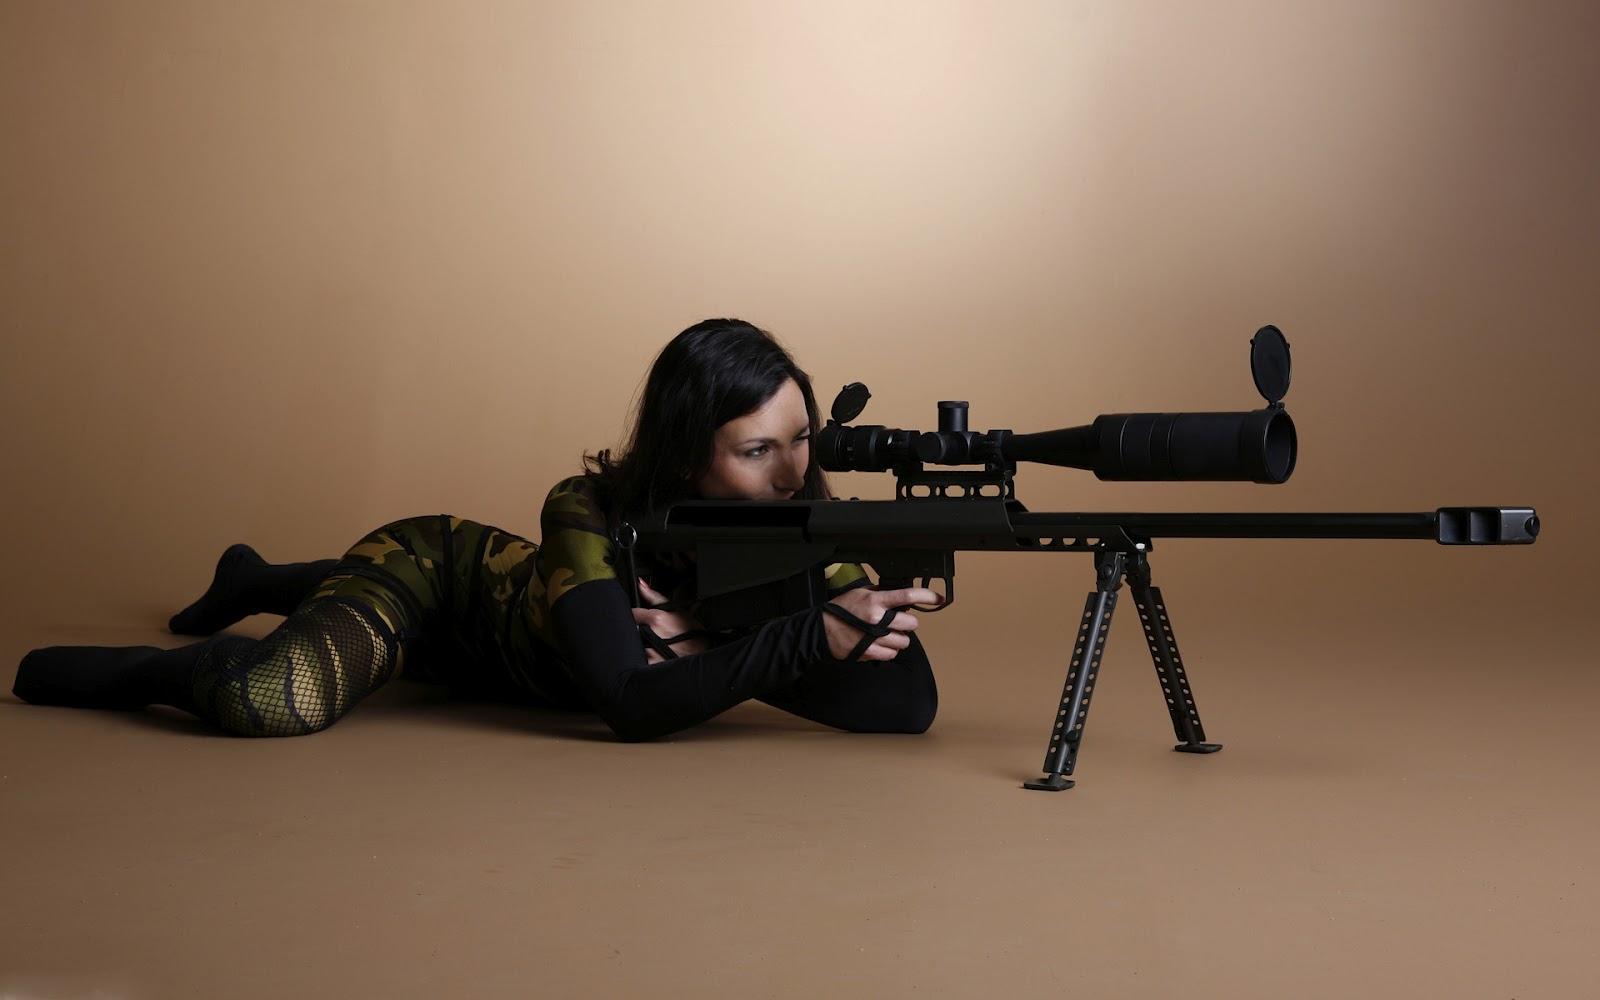 sexy girl sniper, wallpaper, обои на рабочий стол, девушка снайпер, сексуальная